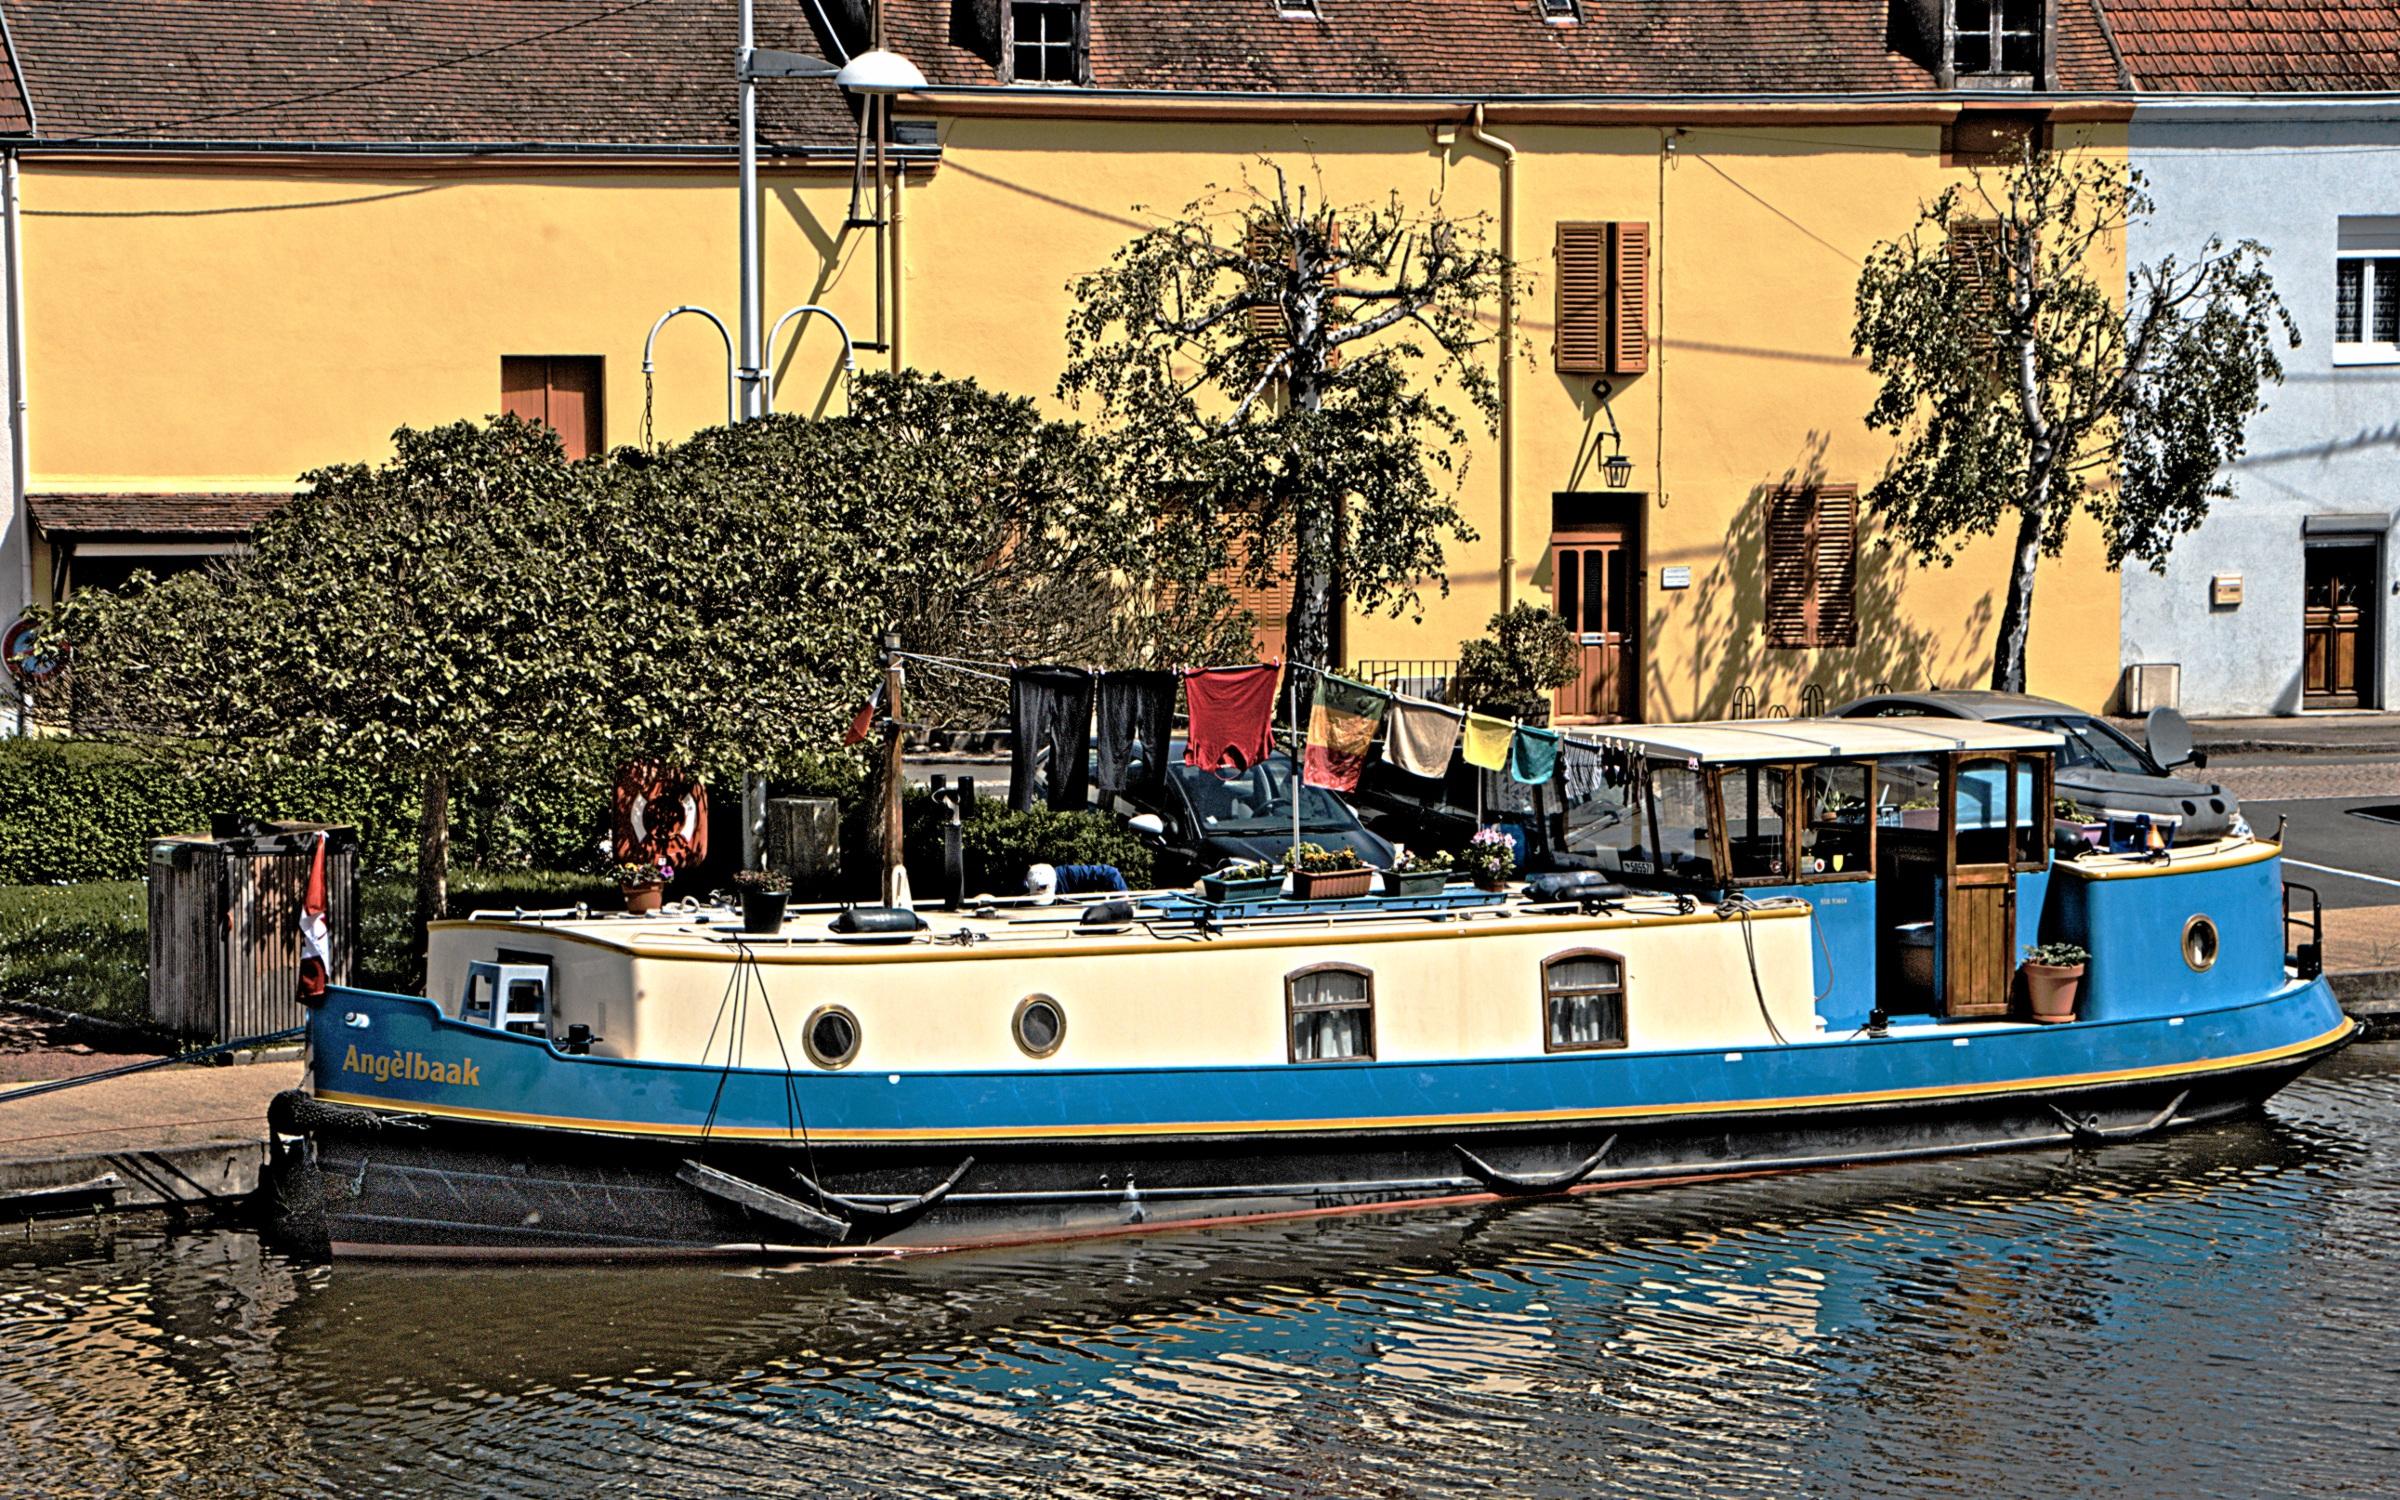 Kostenlose foto : Boot, Kanal, Schiff, Betrachtung, Fahrzeug ...